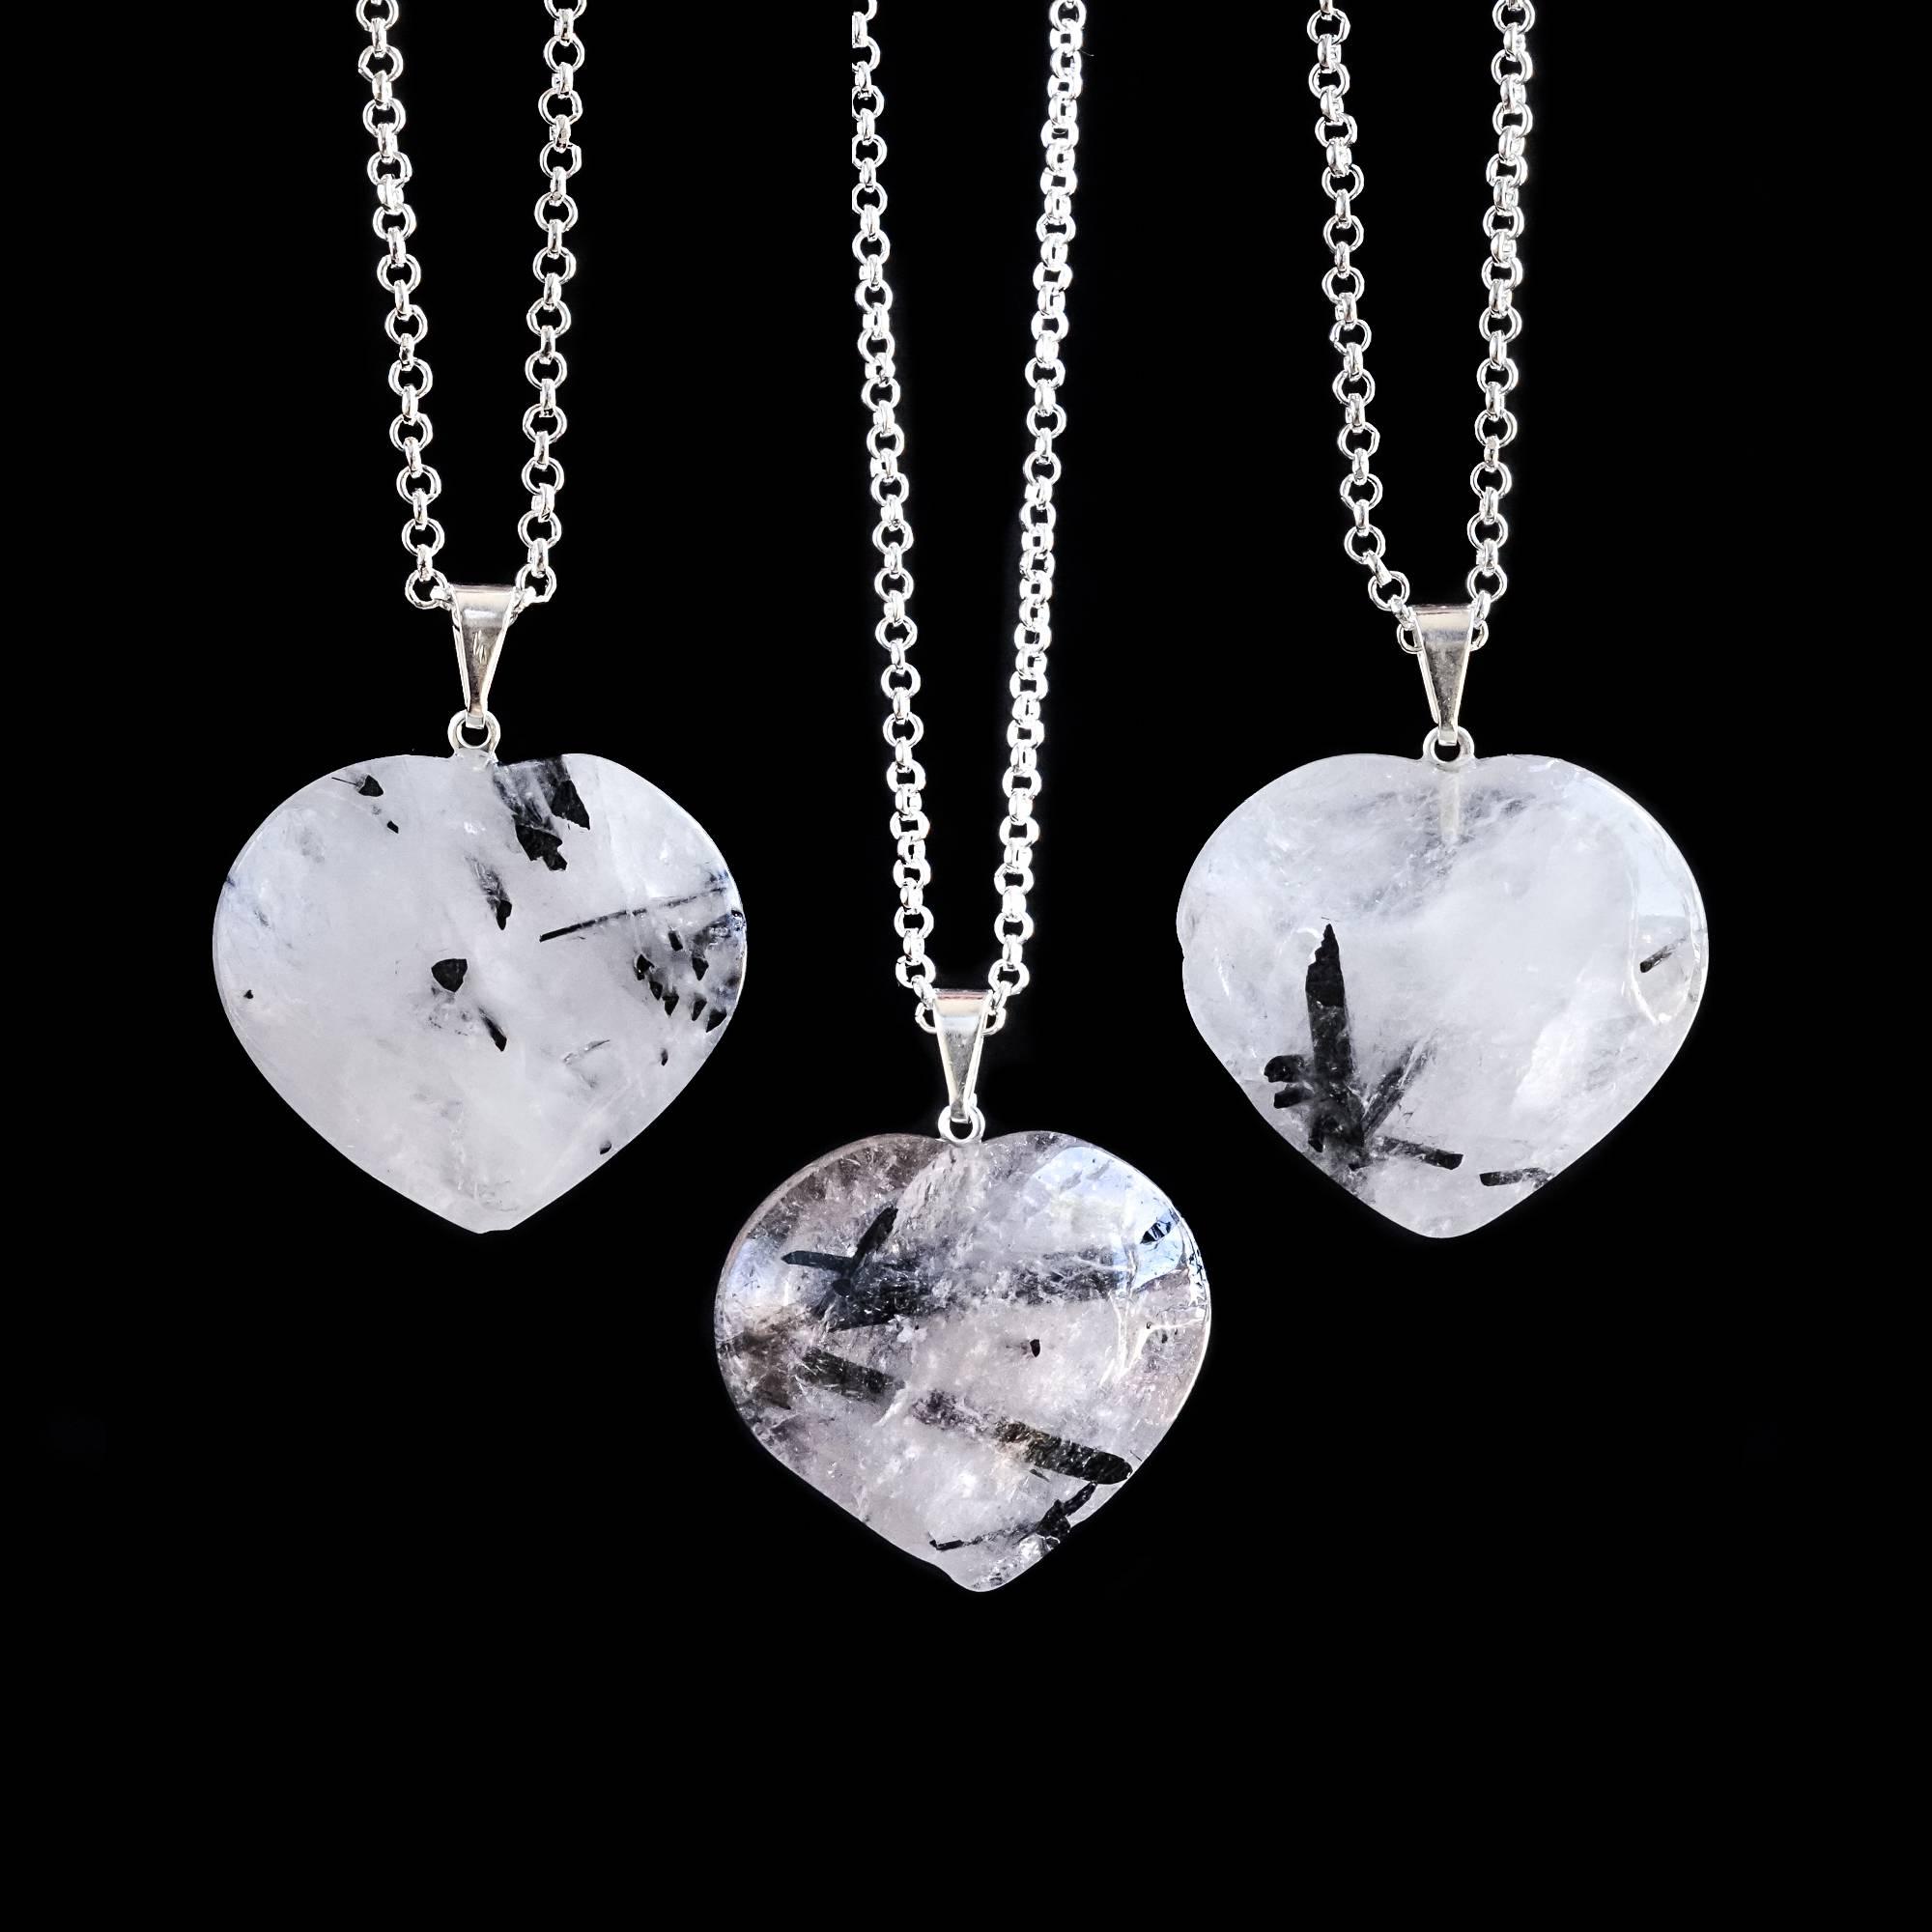 Tourmalinated quartz heart pendants for protection and white light tourmalinated quartz heart pendants aloadofball Image collections